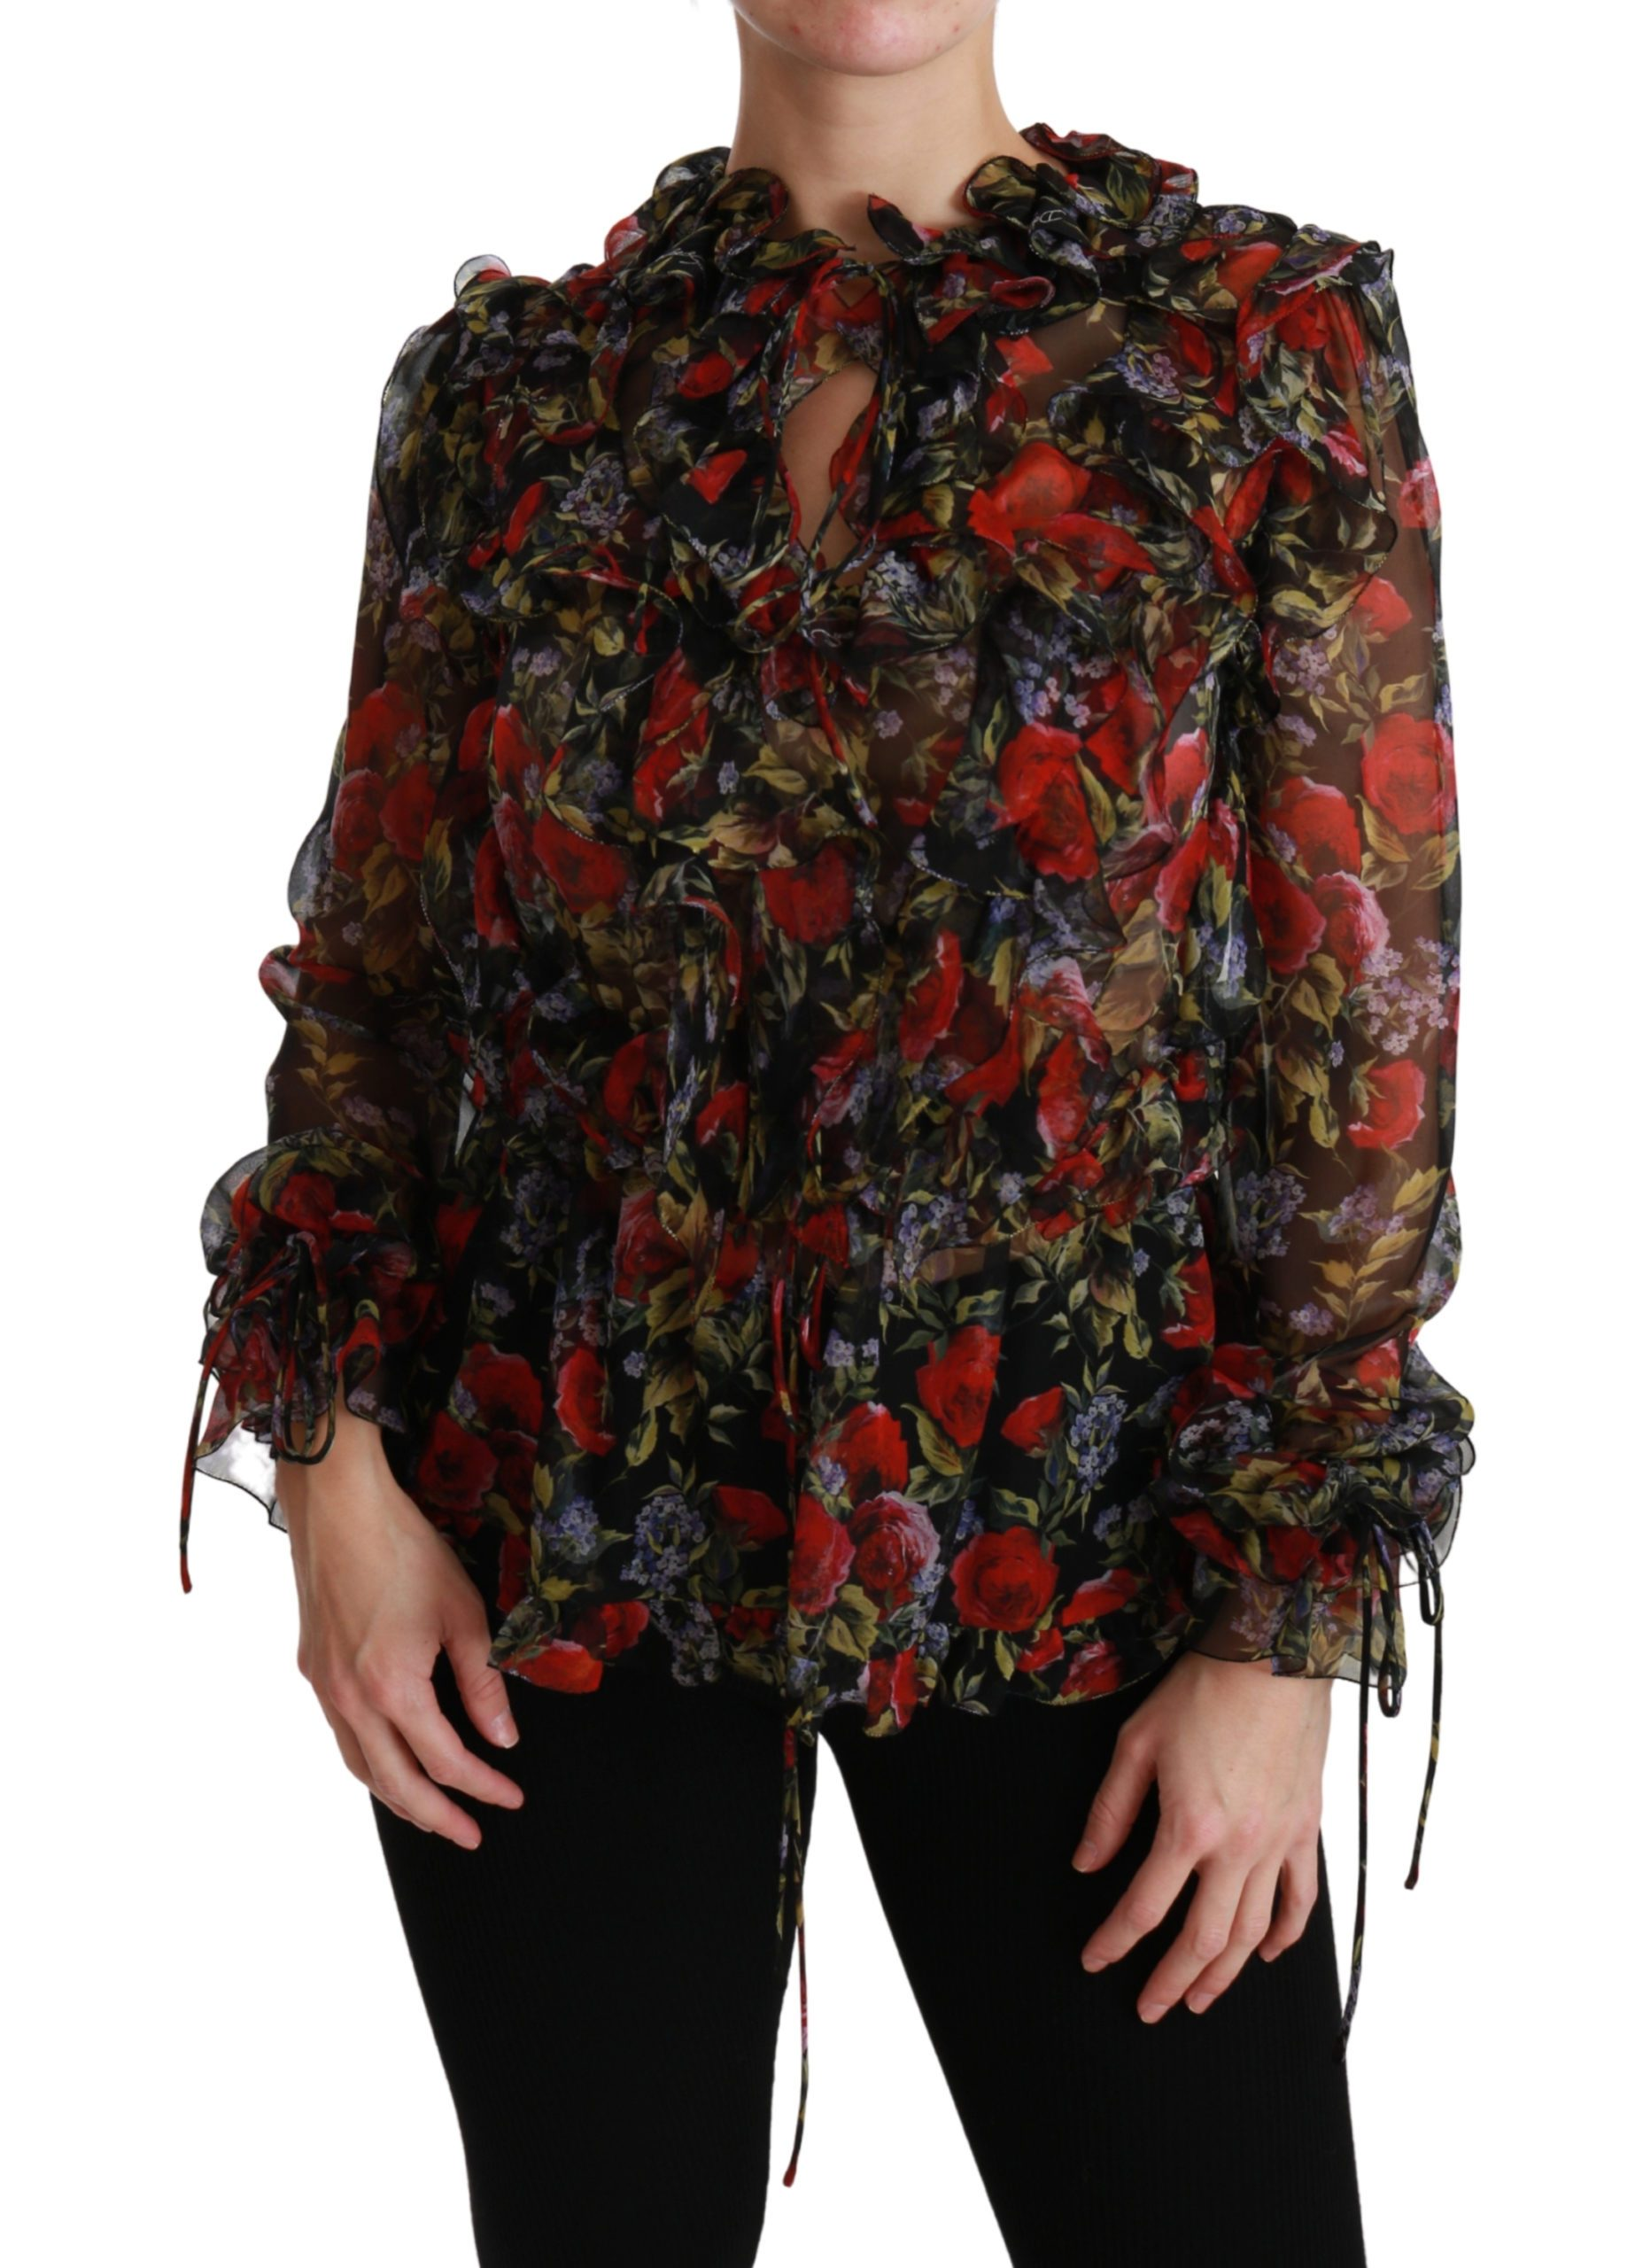 Black Floral Roses Blouse Silk Top - IT36 | XS